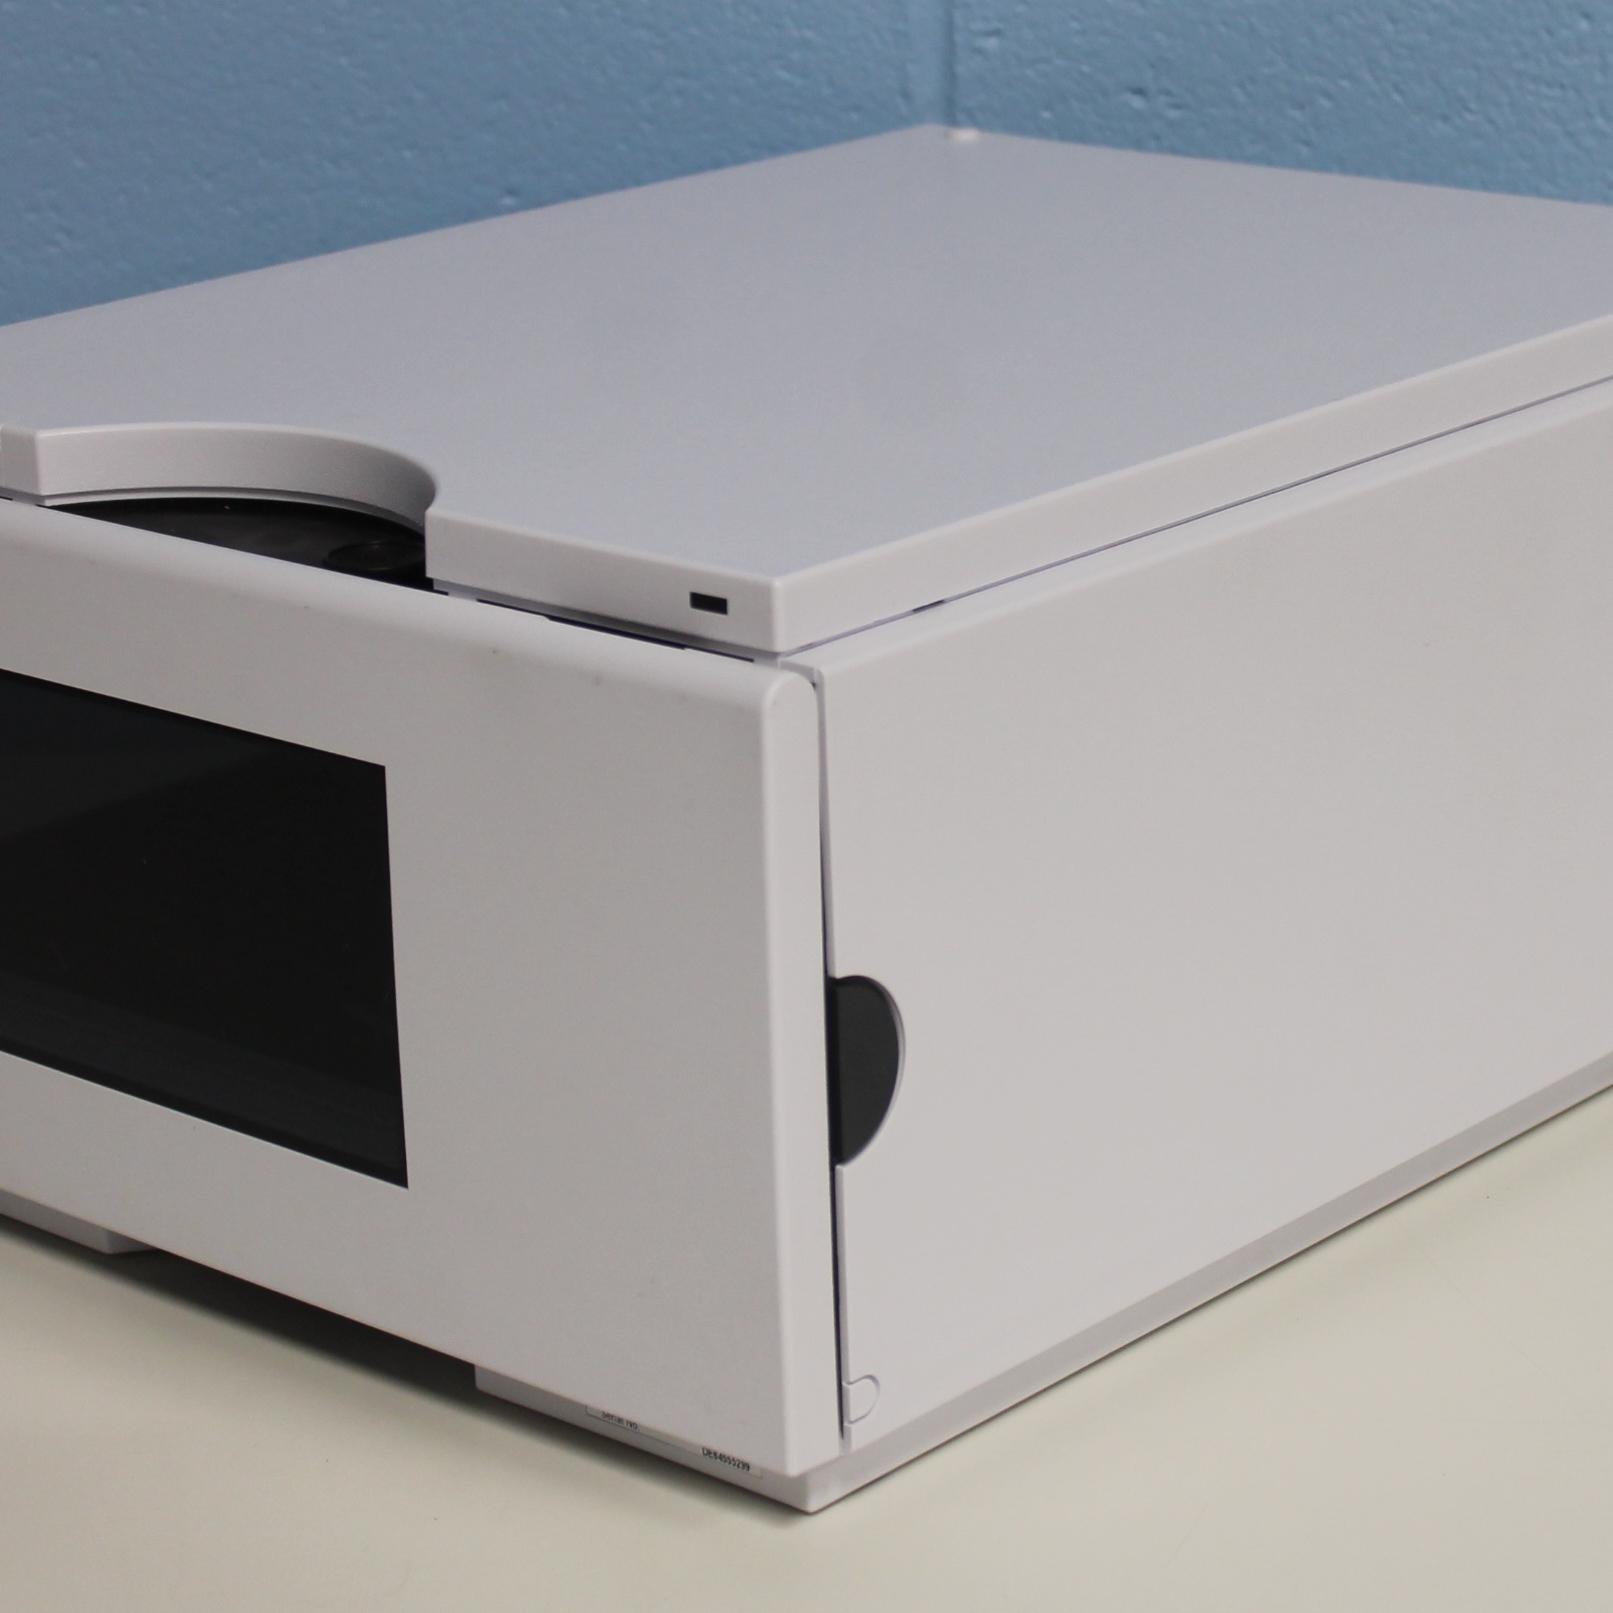 Agilent Technologies 1200 Series G1377A Micro-WPS Image